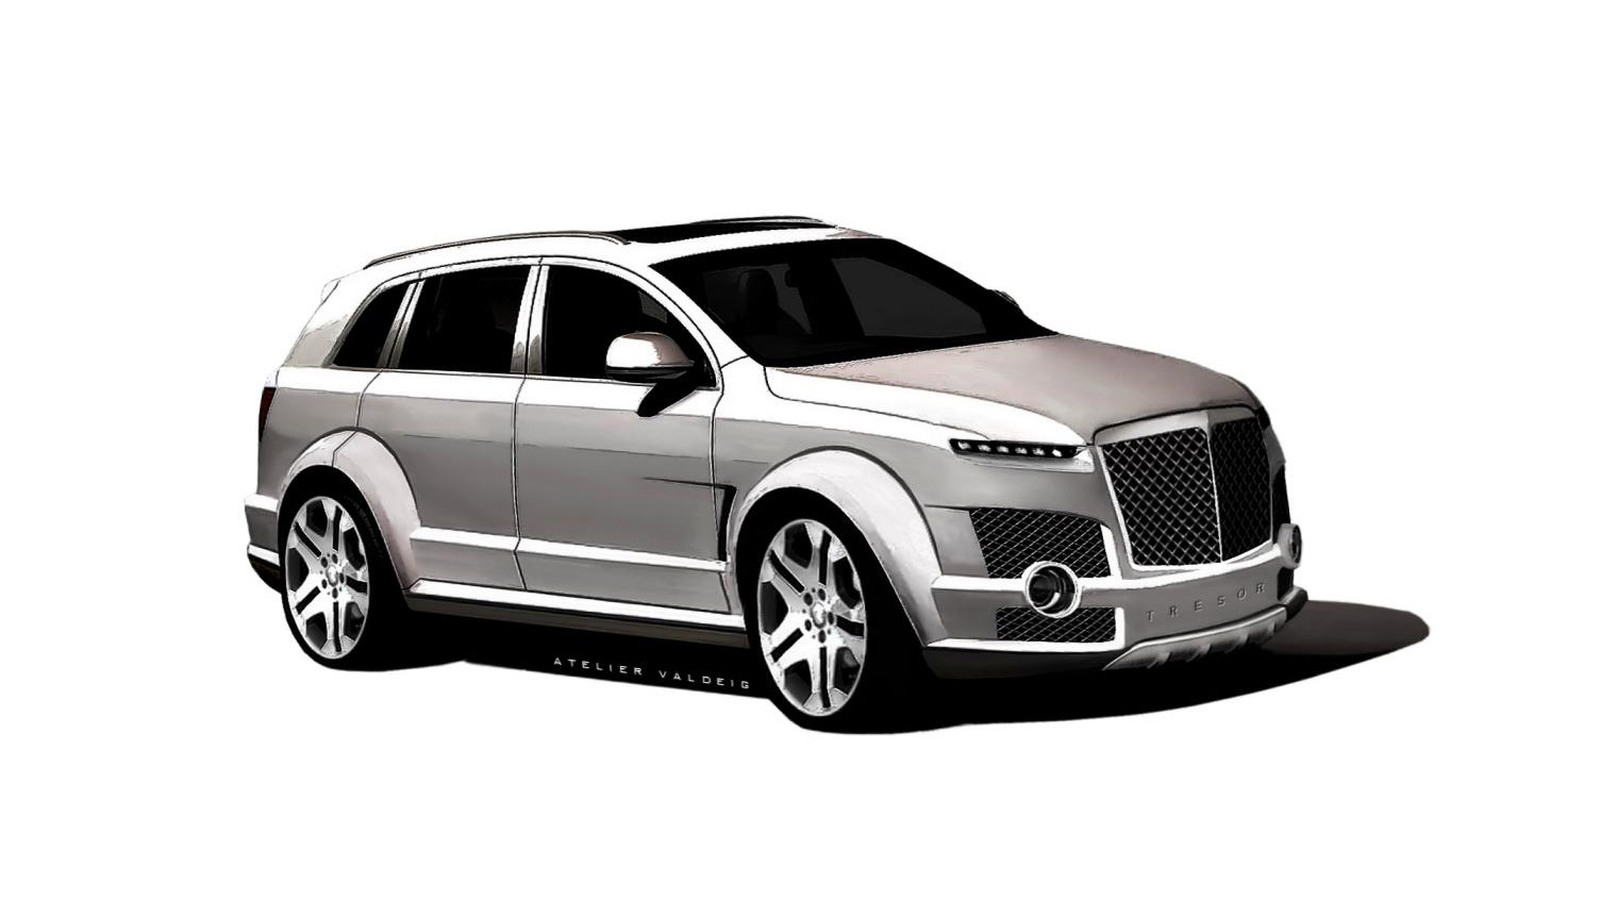 Atelier Valdeig Tresor SUV renderings